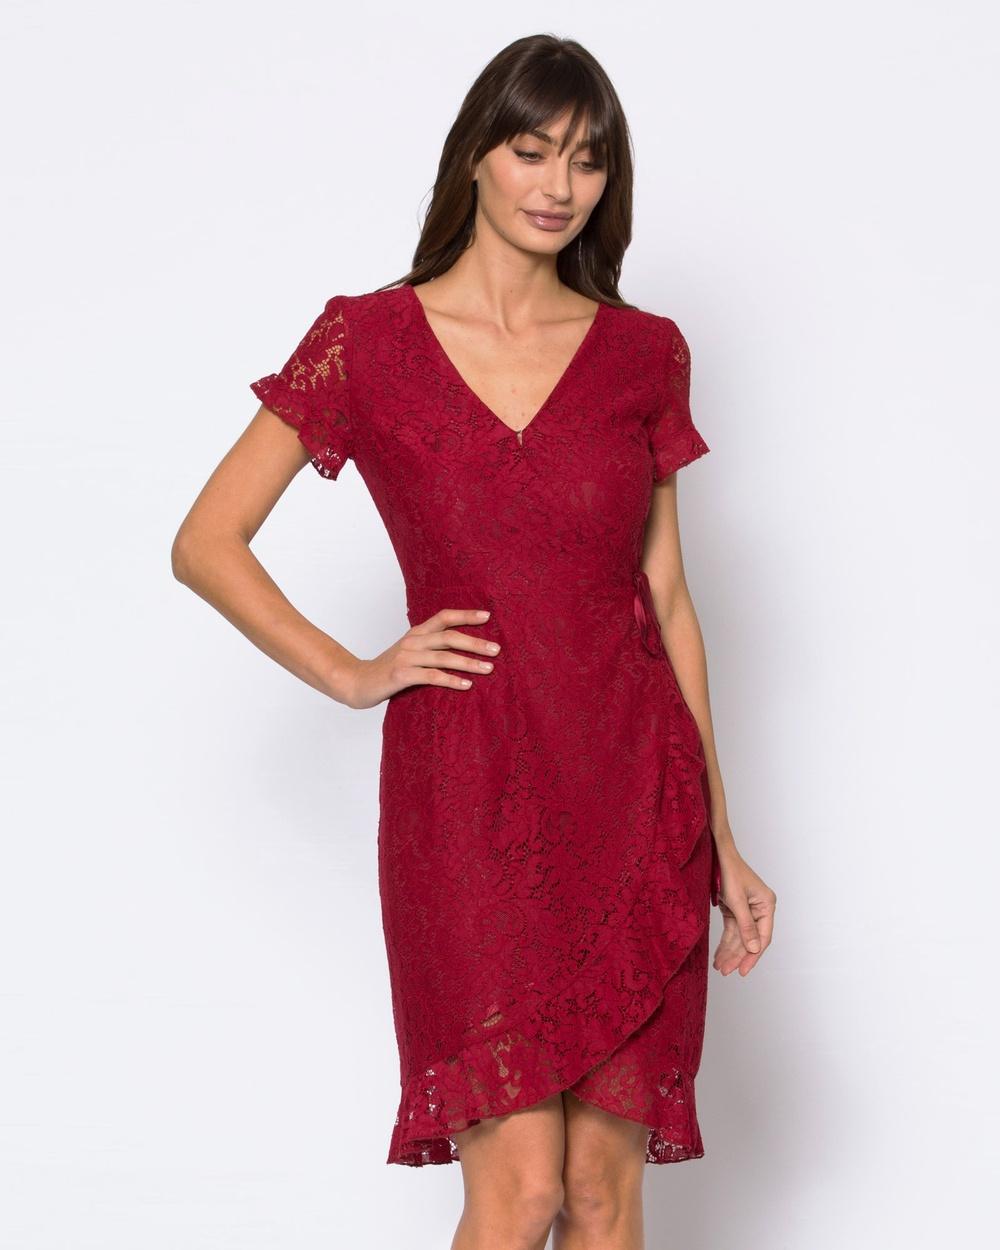 Alannah Hill Red Strawberry Daiquiri Dress